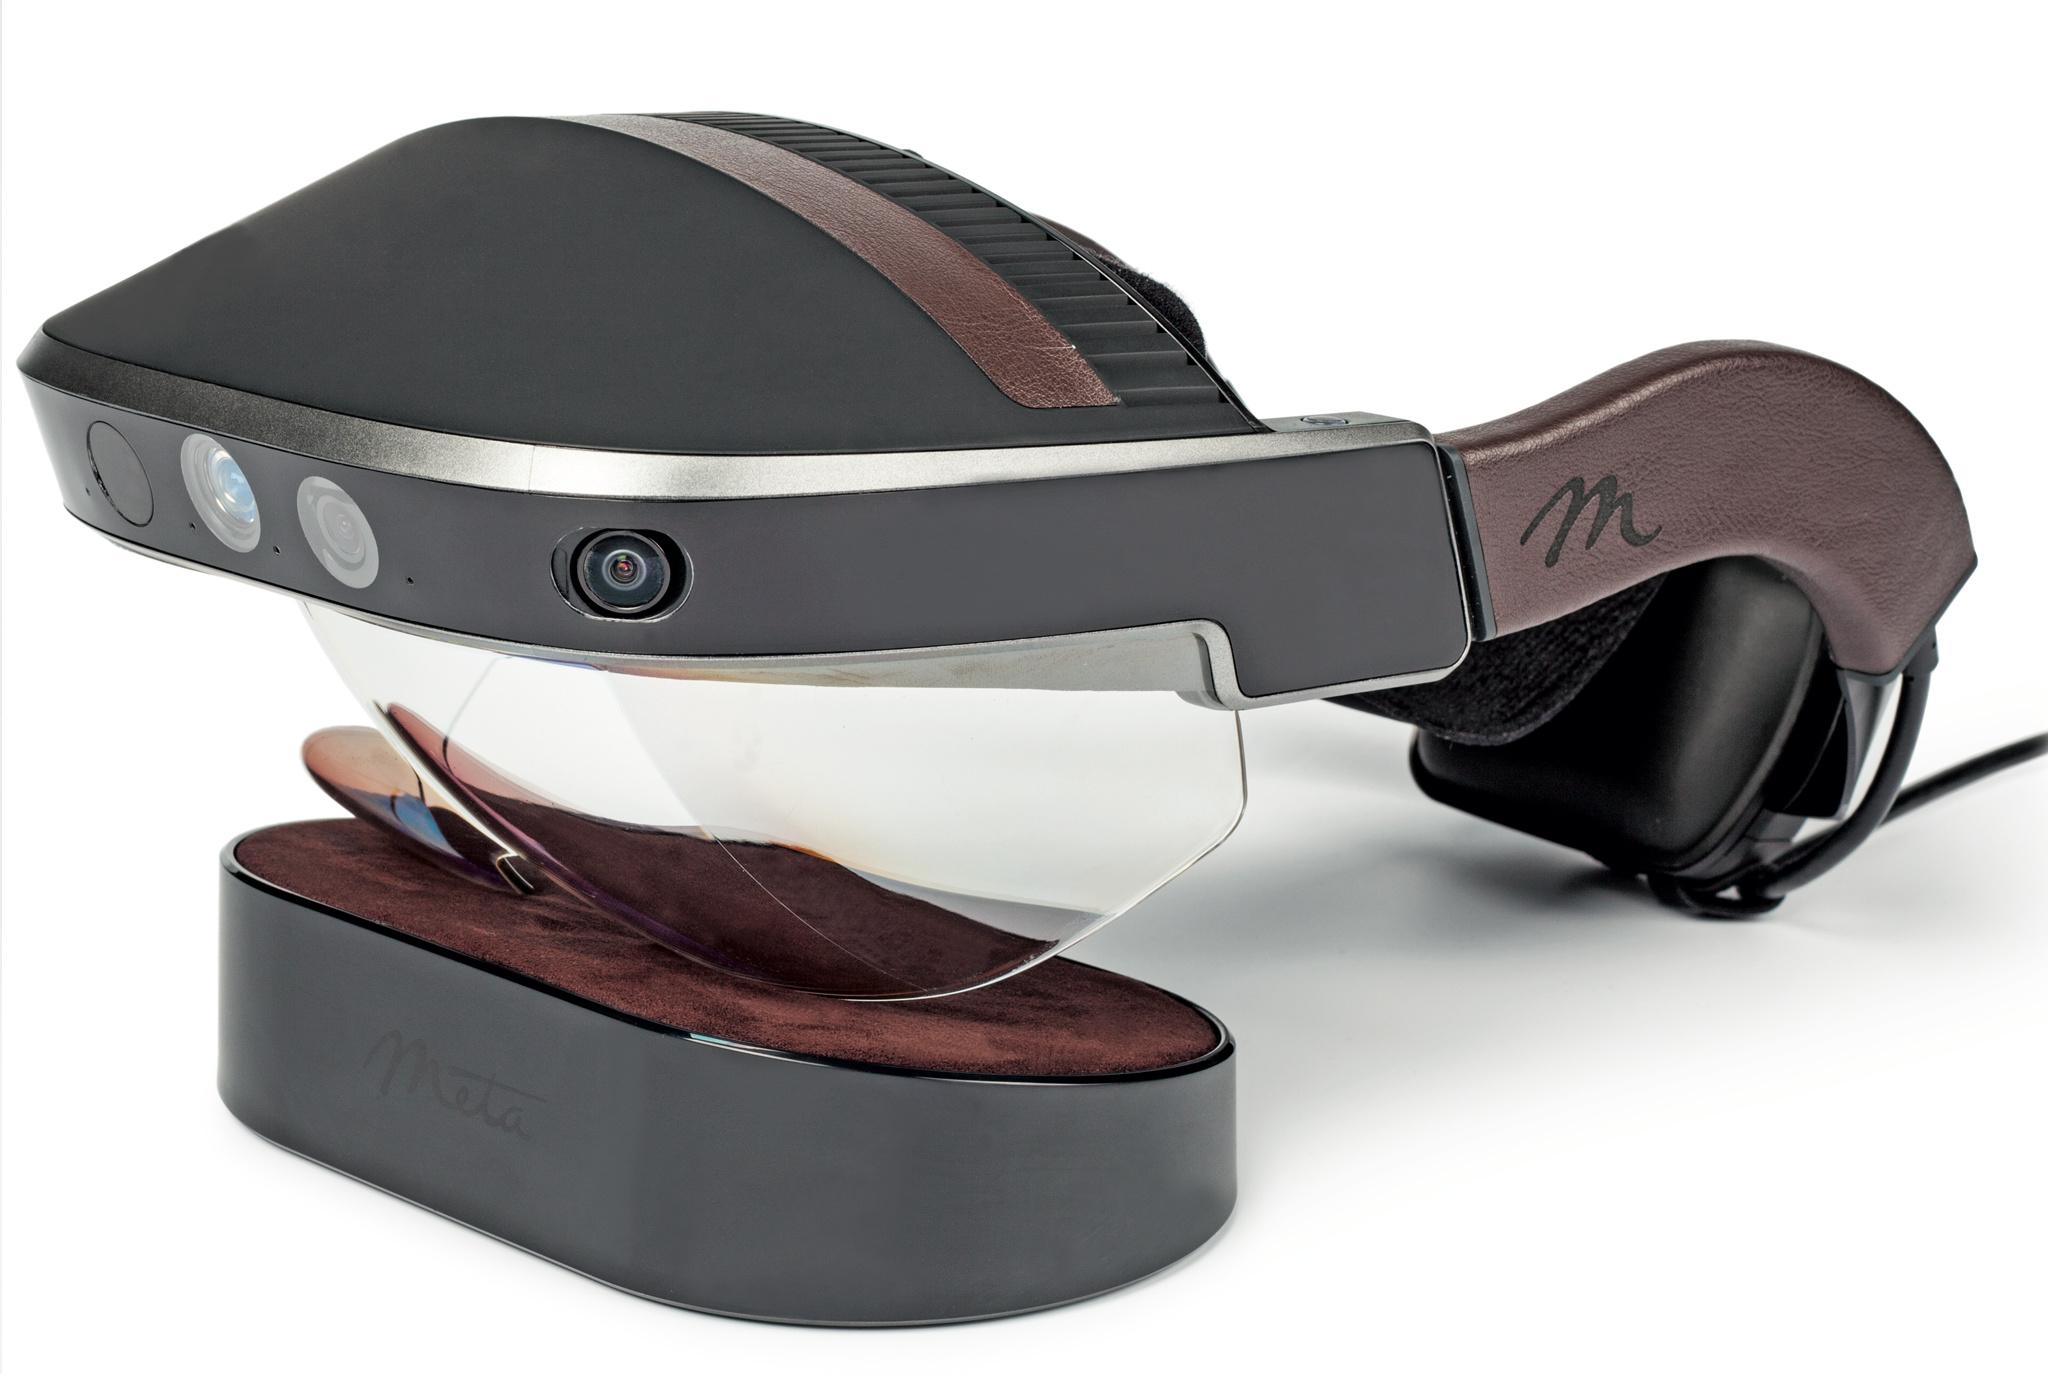 augmented reality brille meta 2 im test c 39 t magazin. Black Bedroom Furniture Sets. Home Design Ideas